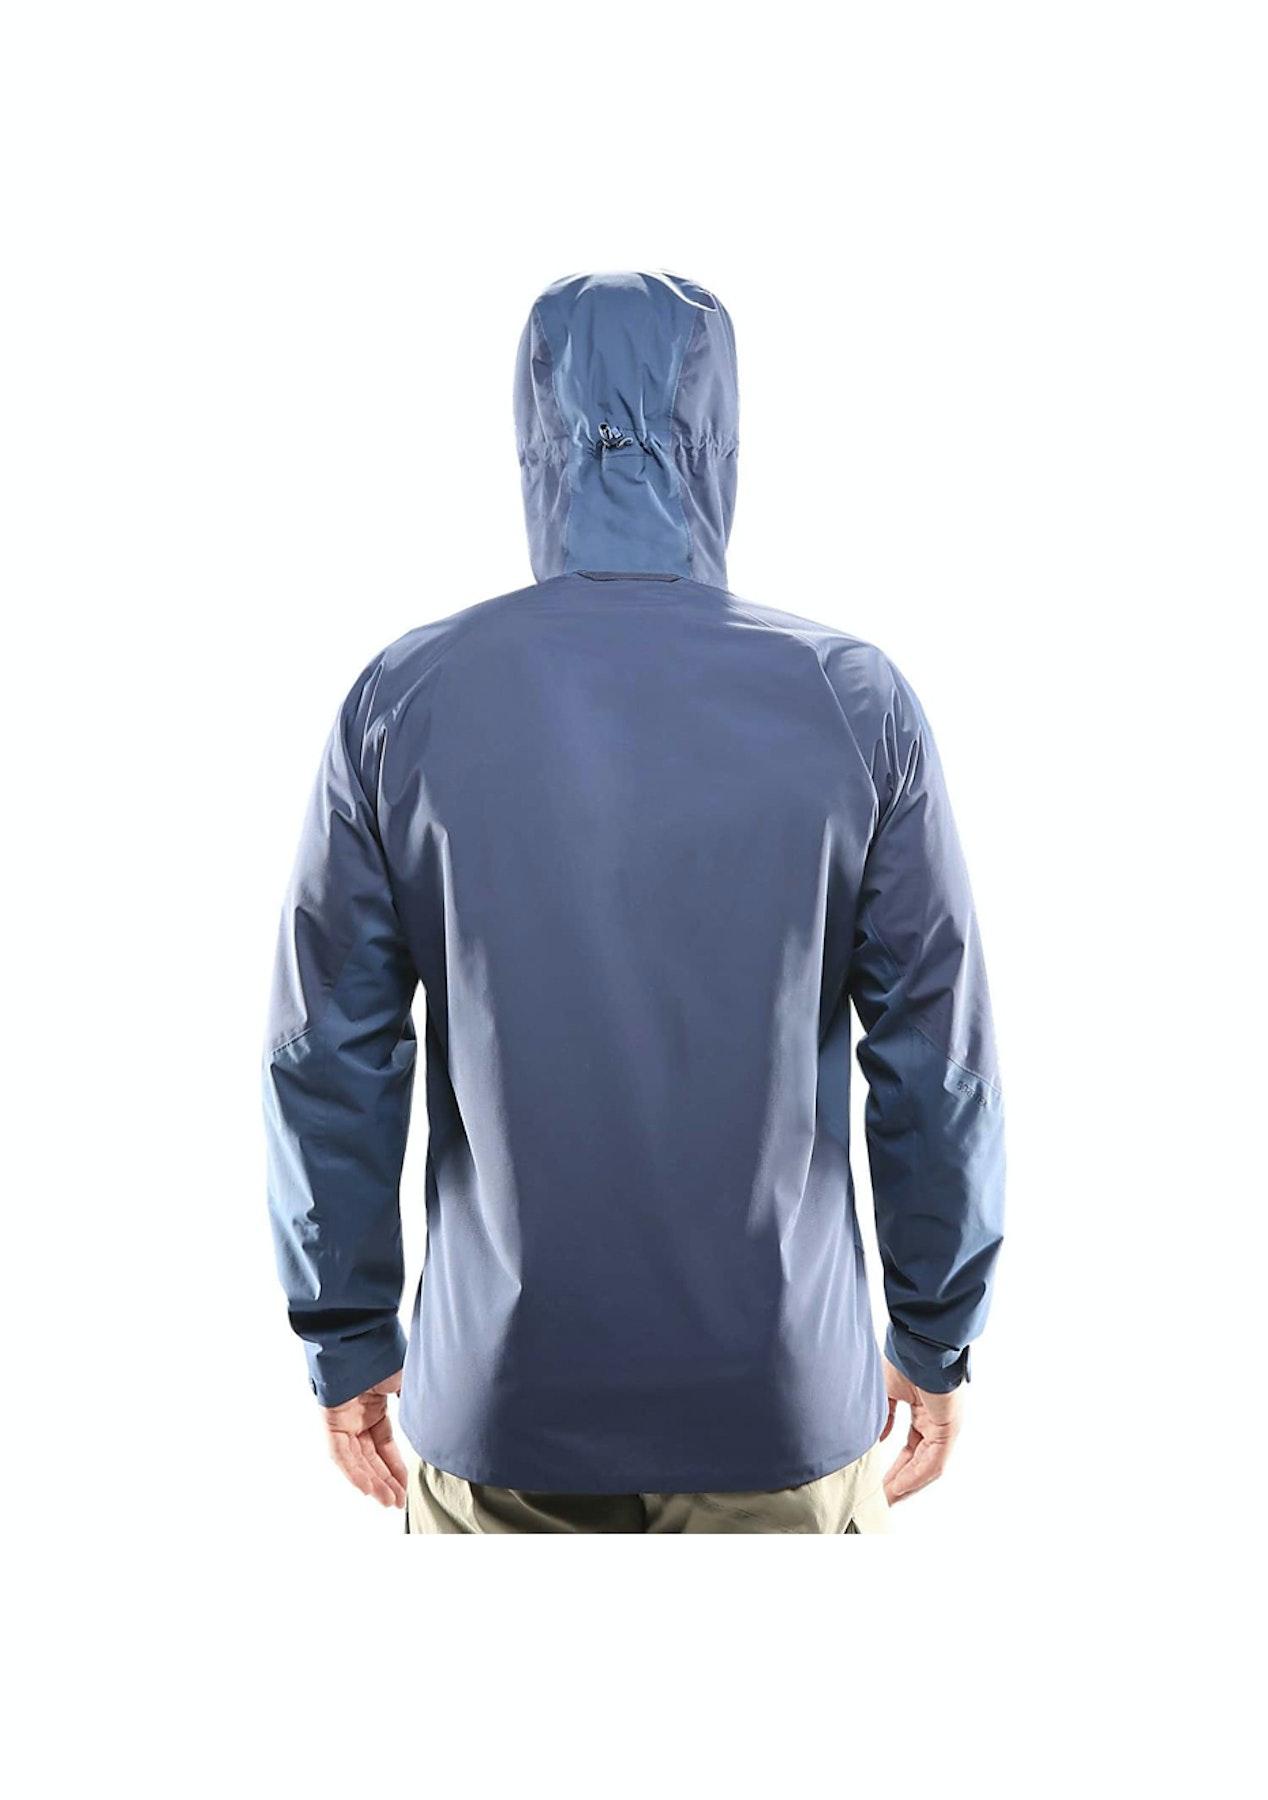 Hägloffs - Virgo Jacket Men 3NP Blue Ink/Tarn Blue ...